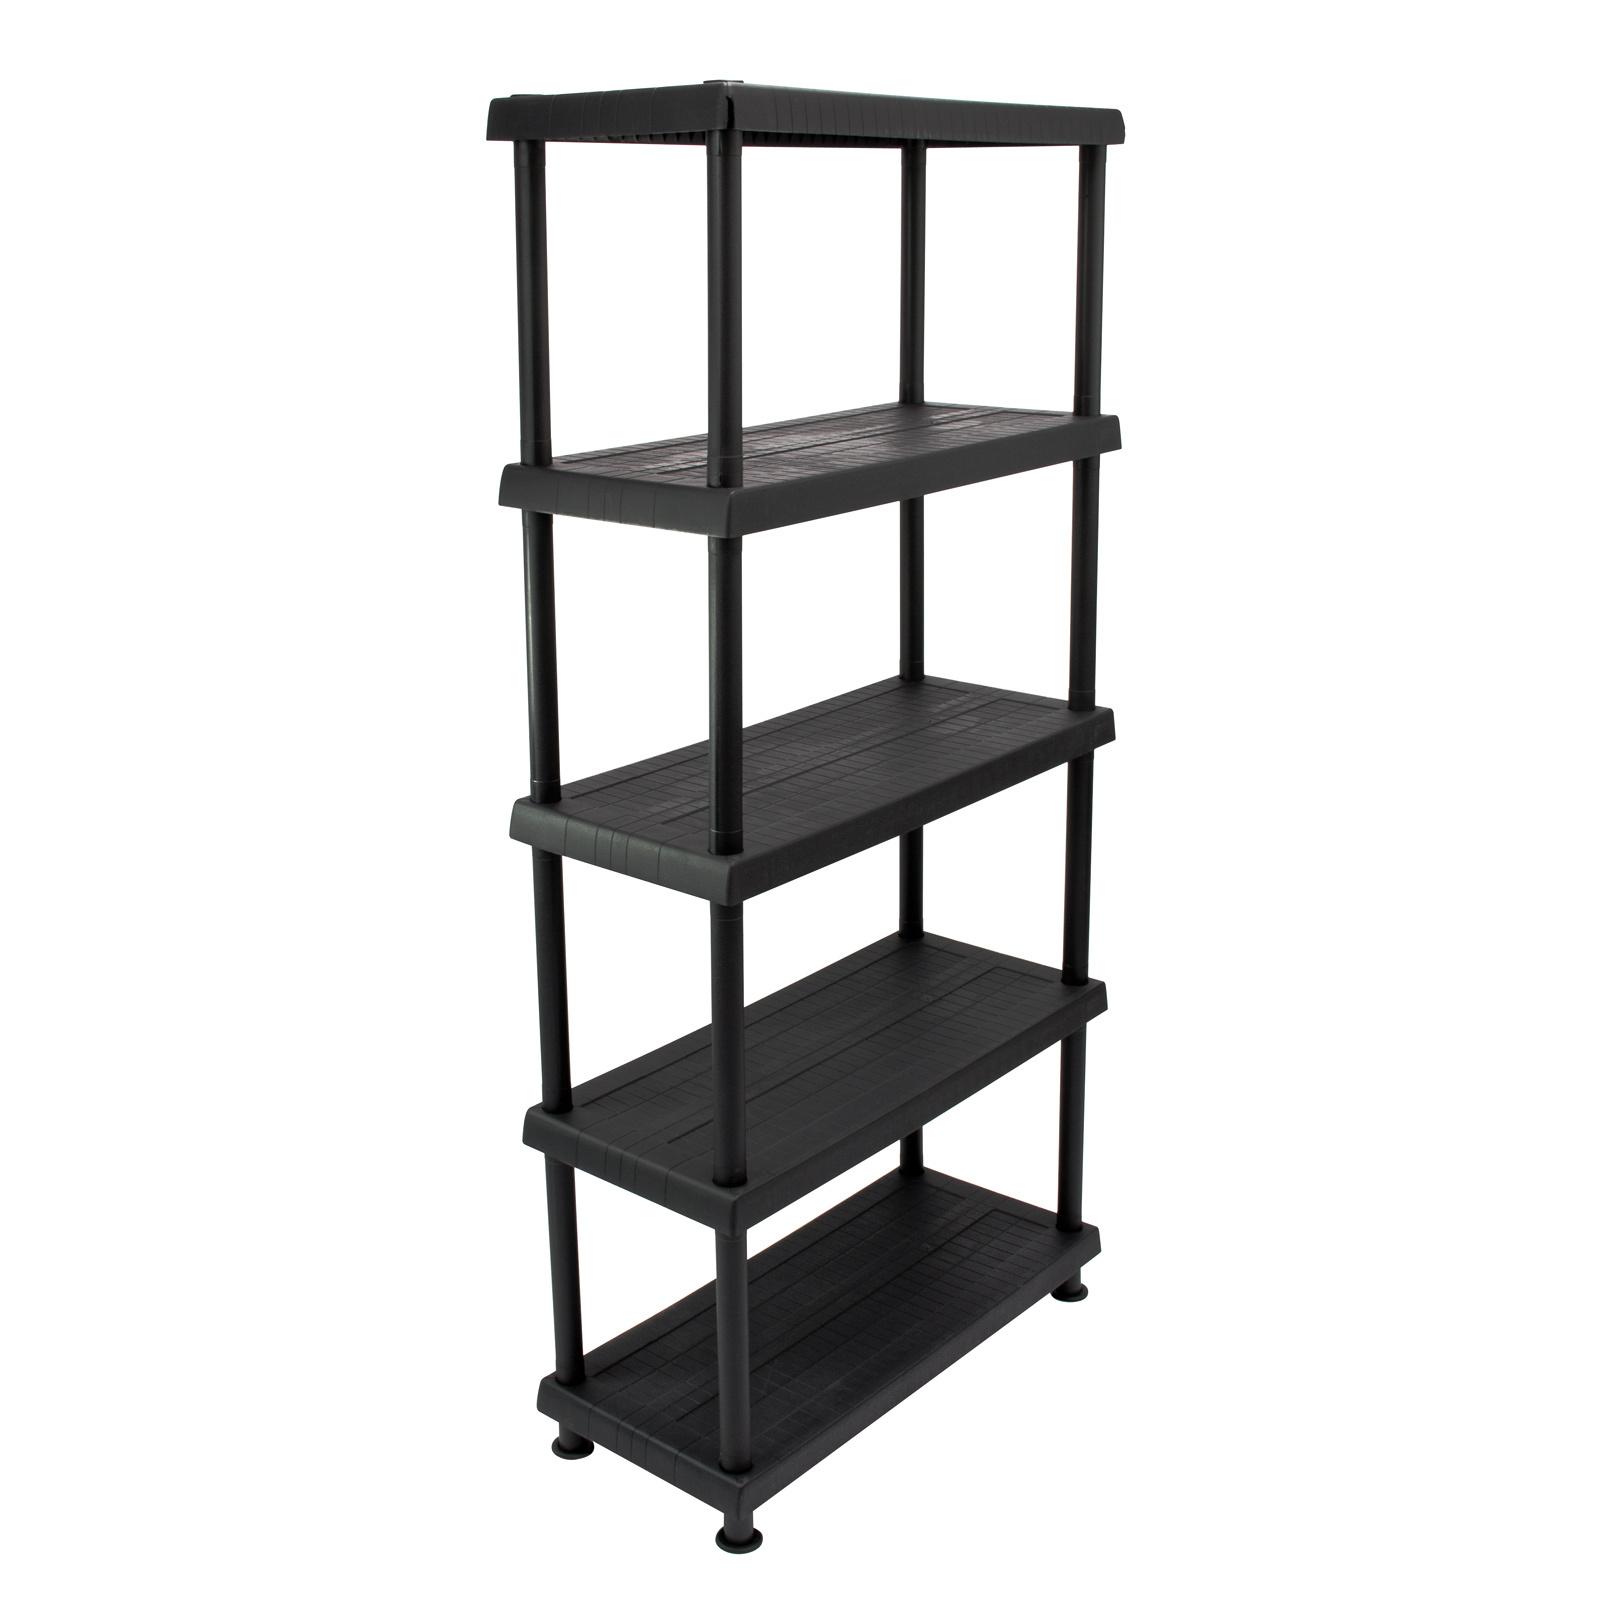 kunststoffregal allzweck regal f r keller garage werkstatt schwarz 5 b den 80 5 ebay. Black Bedroom Furniture Sets. Home Design Ideas